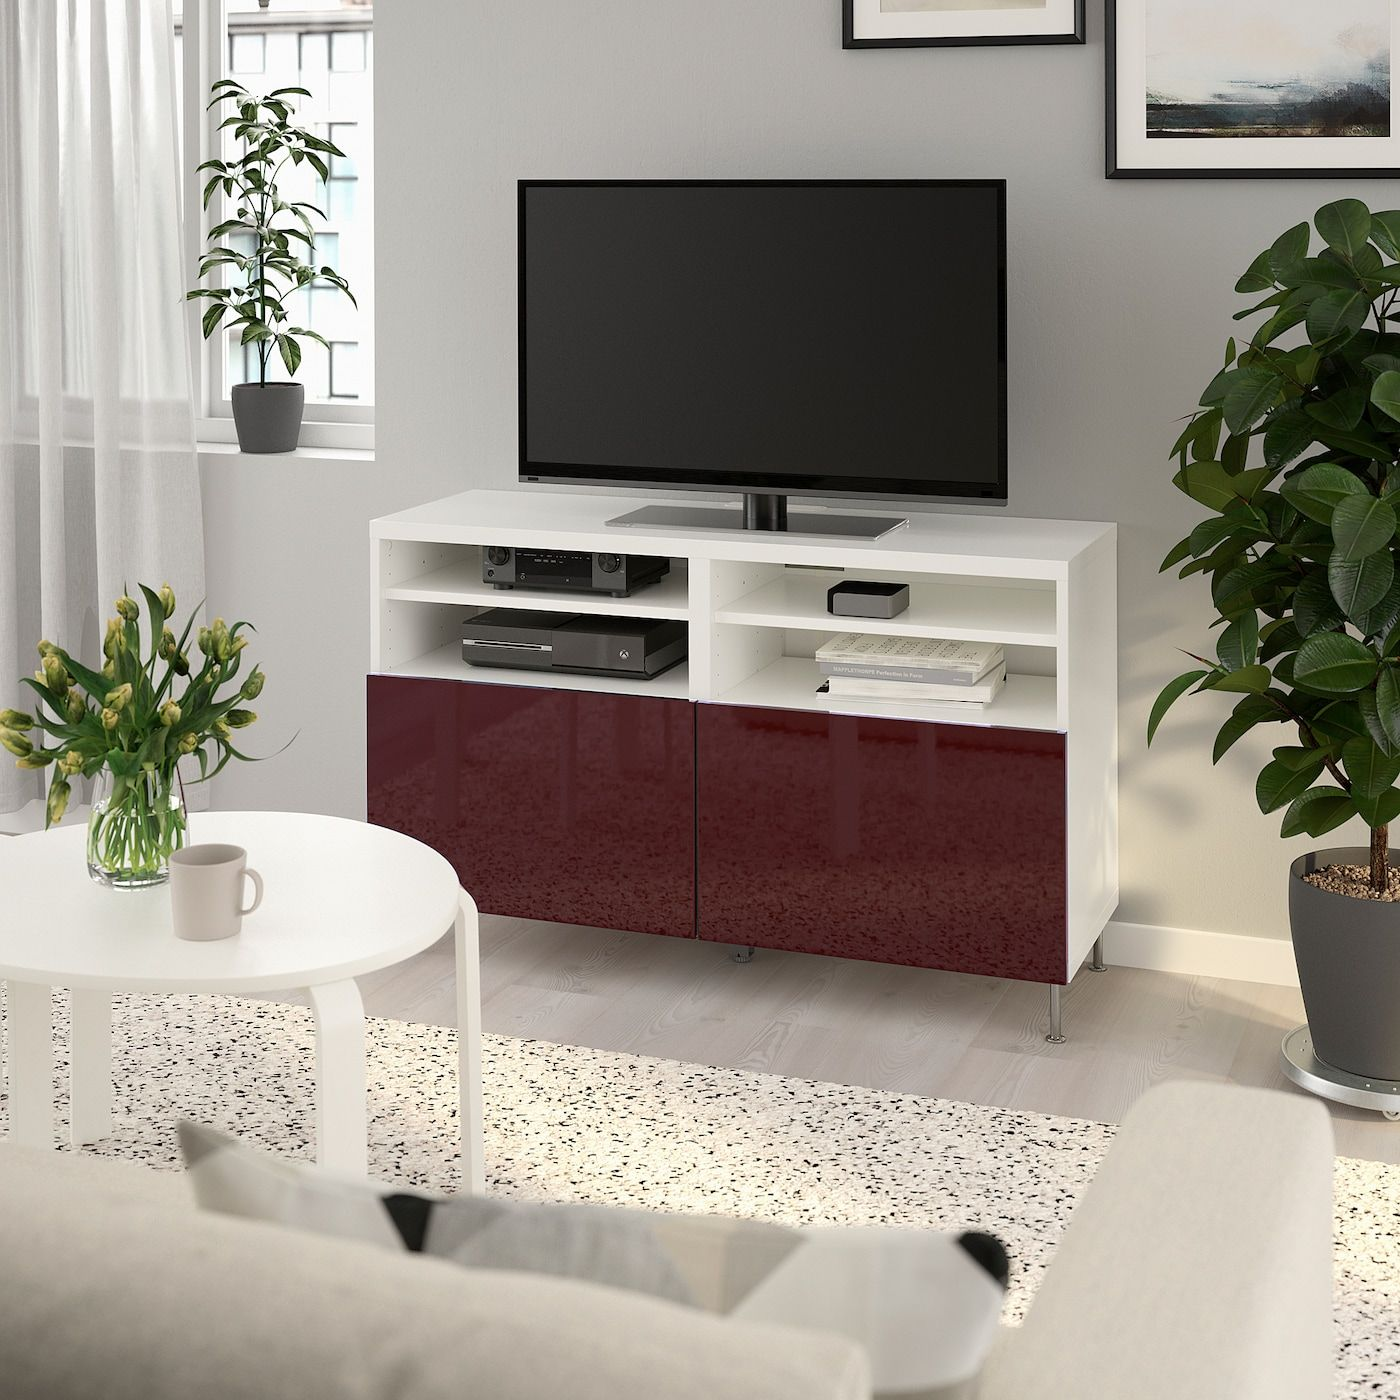 BESTÅ TV unit with doors - white Selsviken/Stallarp, high gloss dark red-brown - IKEA